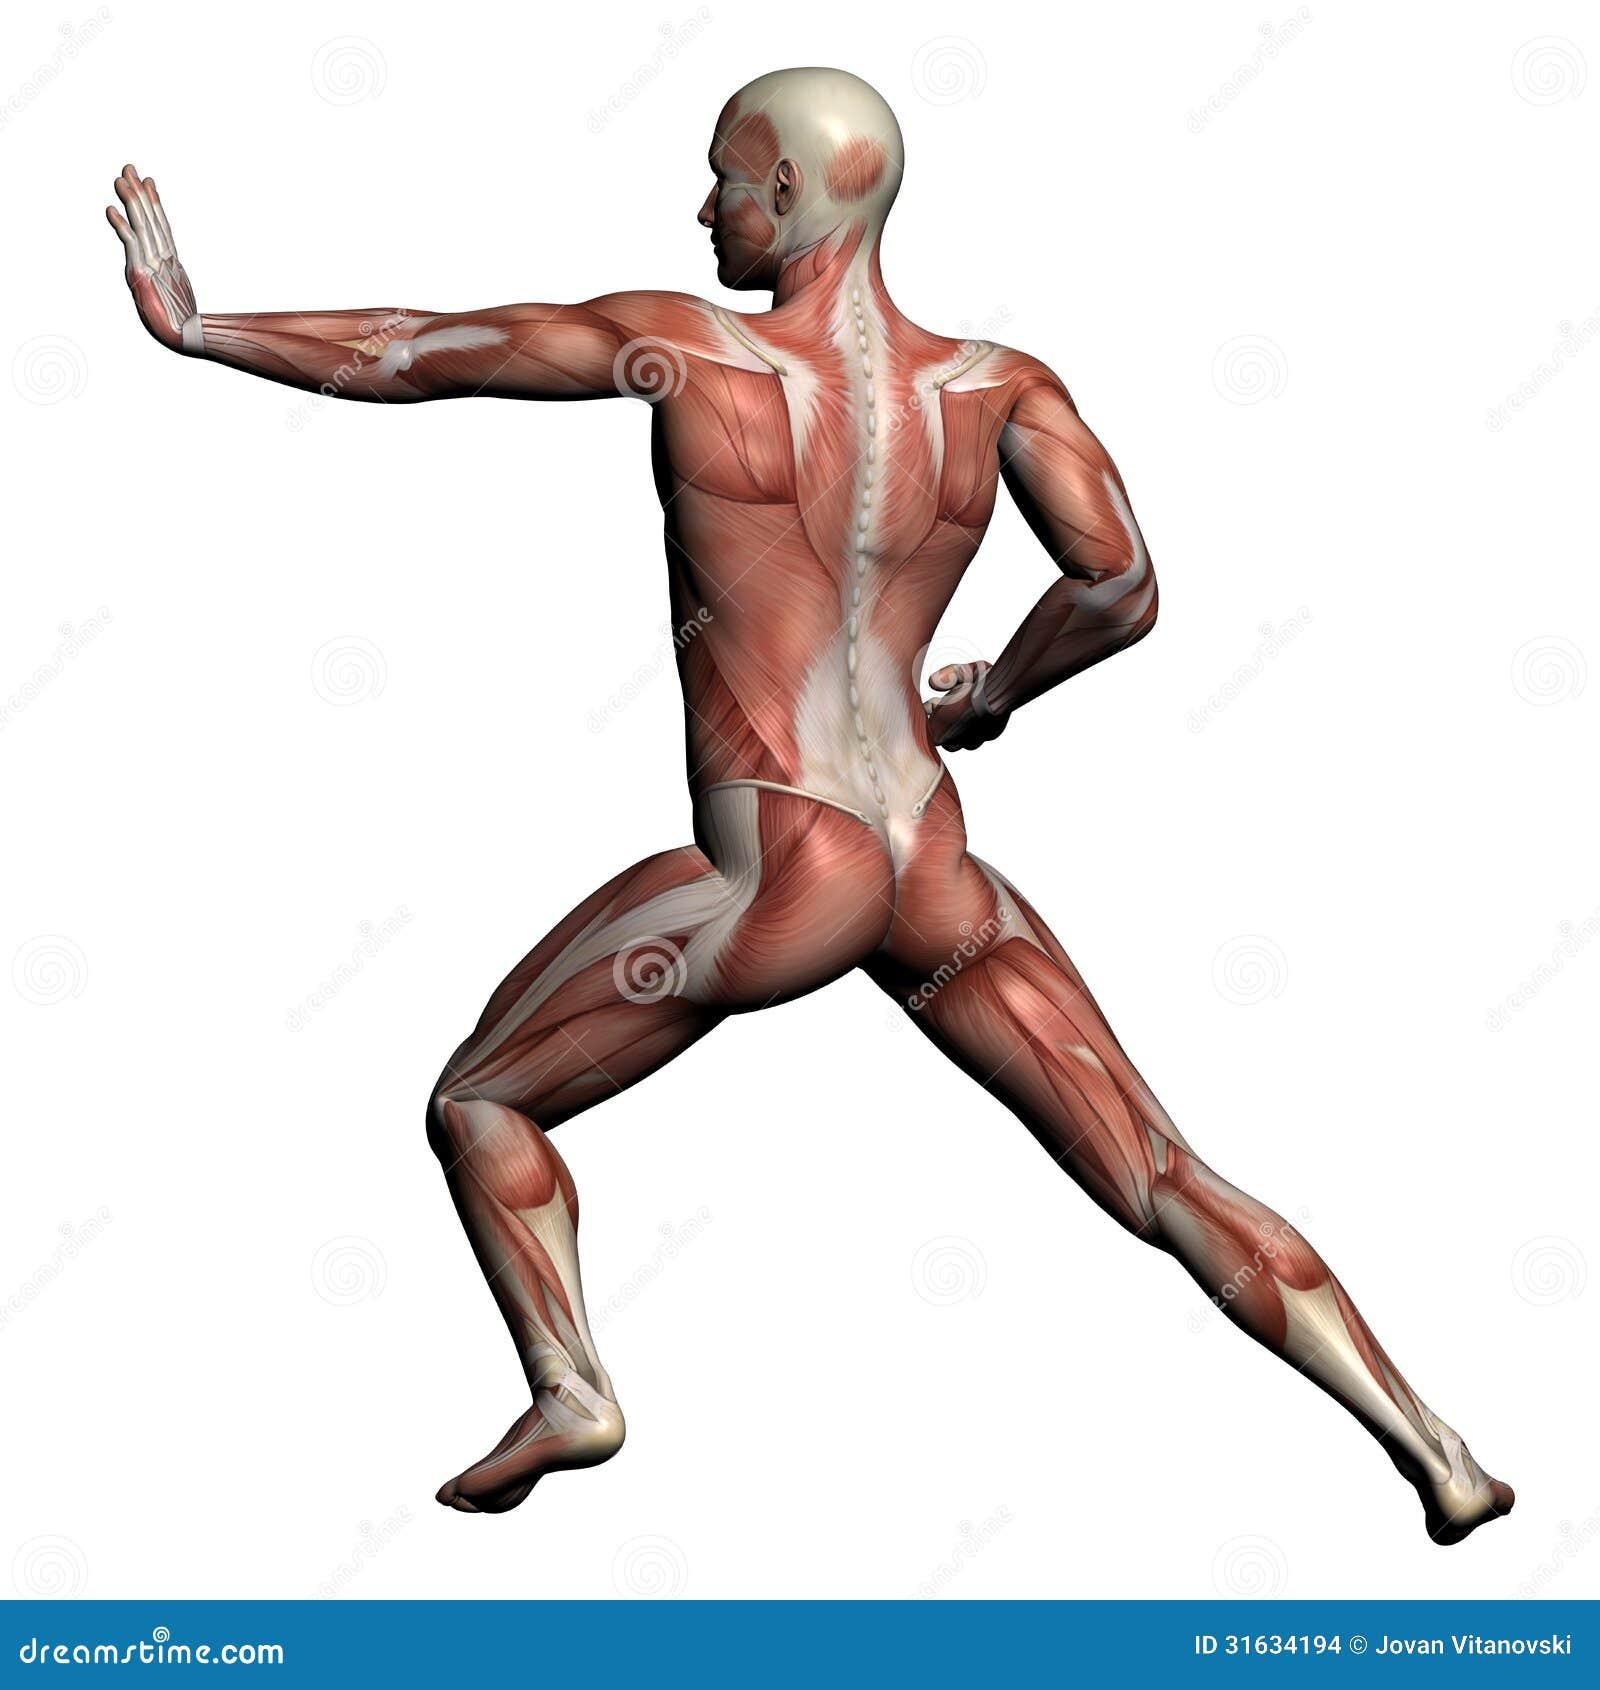 Asombroso Anatomía Muscular 3d Elaboración - Anatomía de Las ...